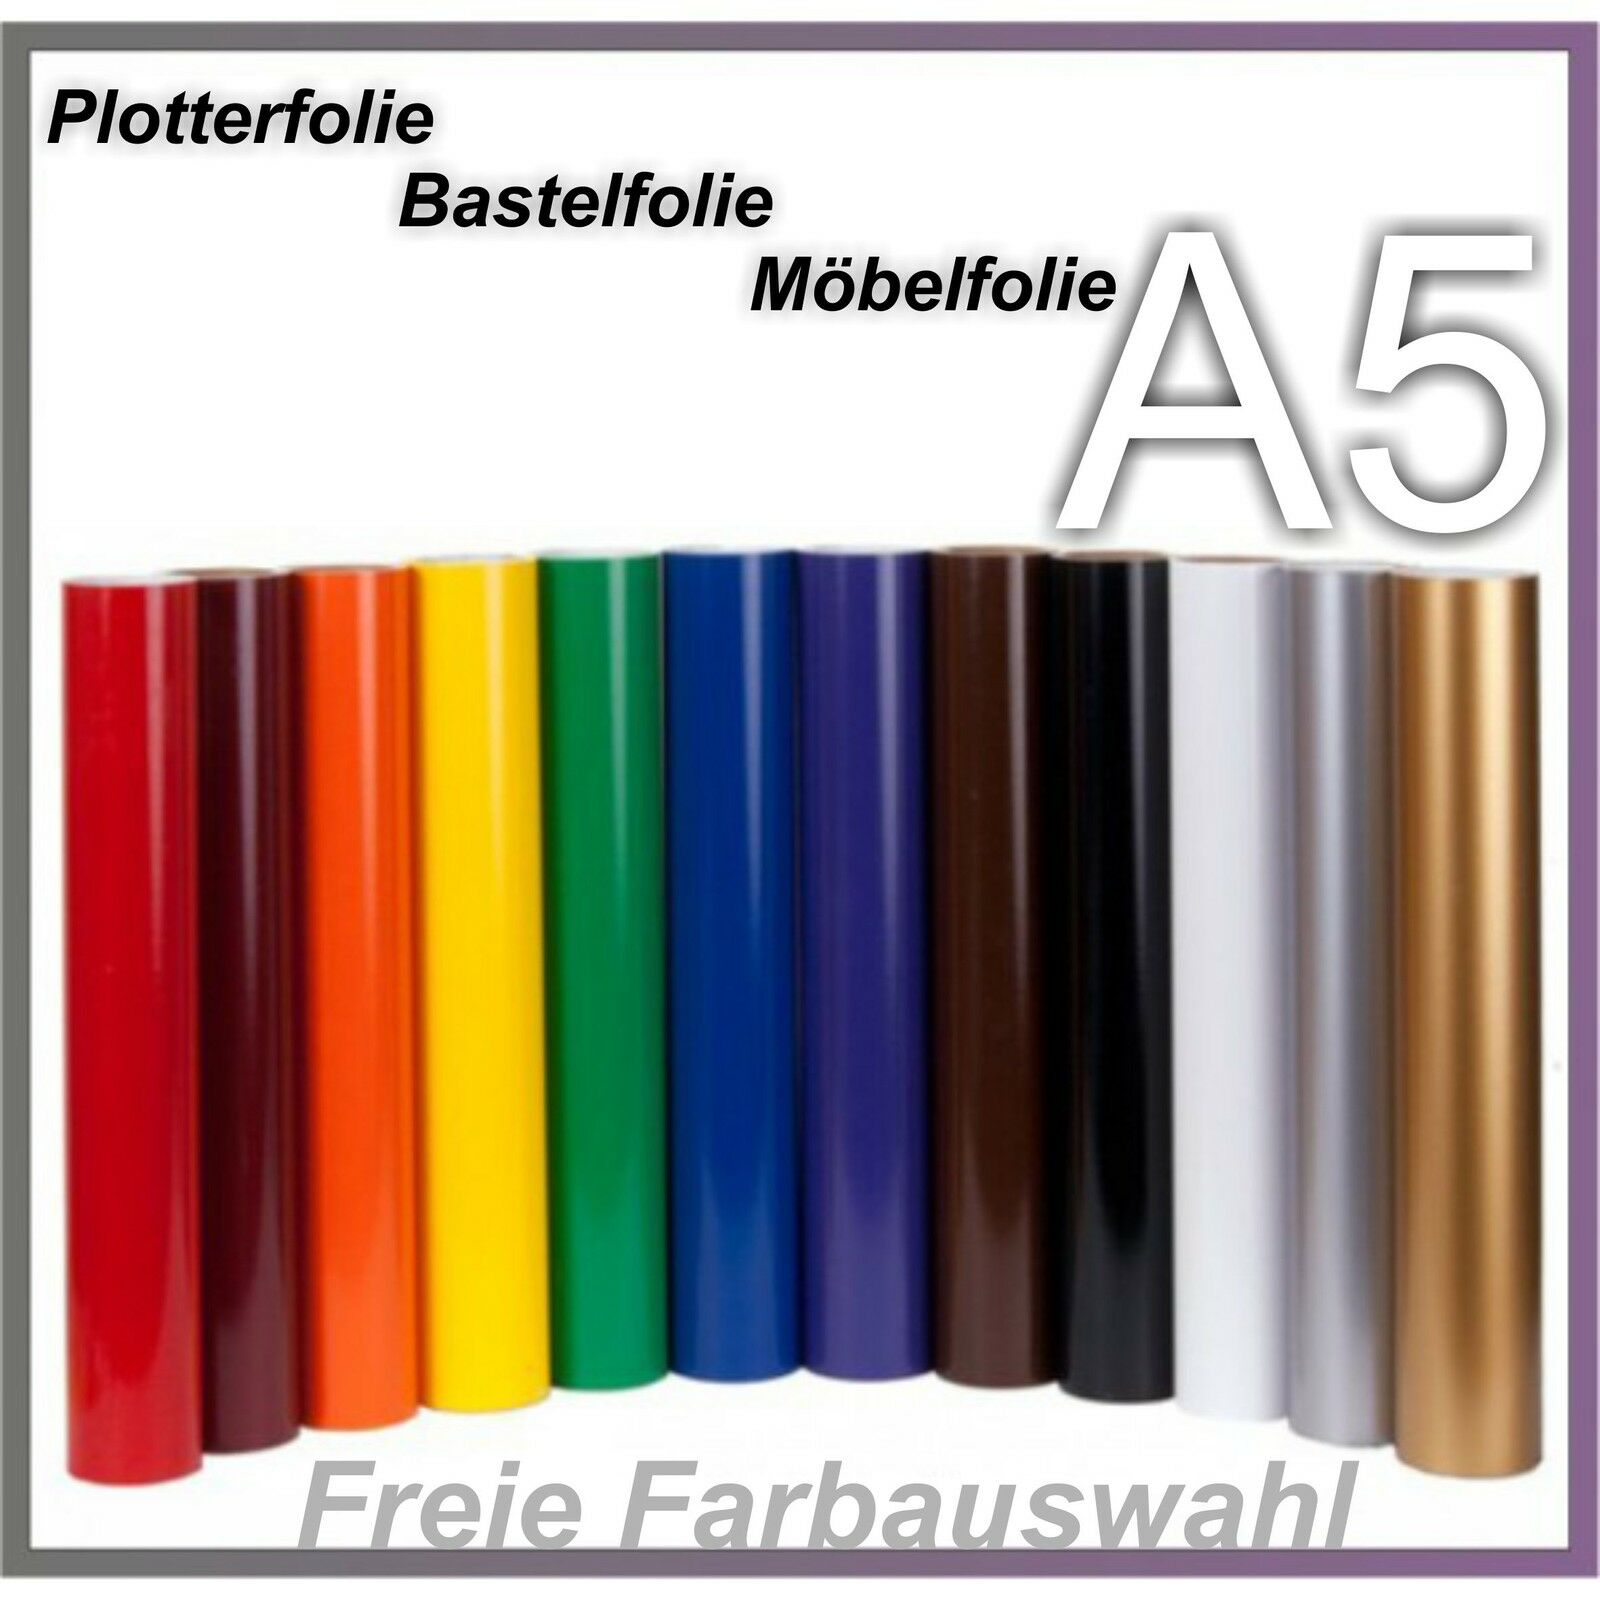 40 96 m a5 plotterfolie bastelfolie m belfolie for Mobelfolie muster